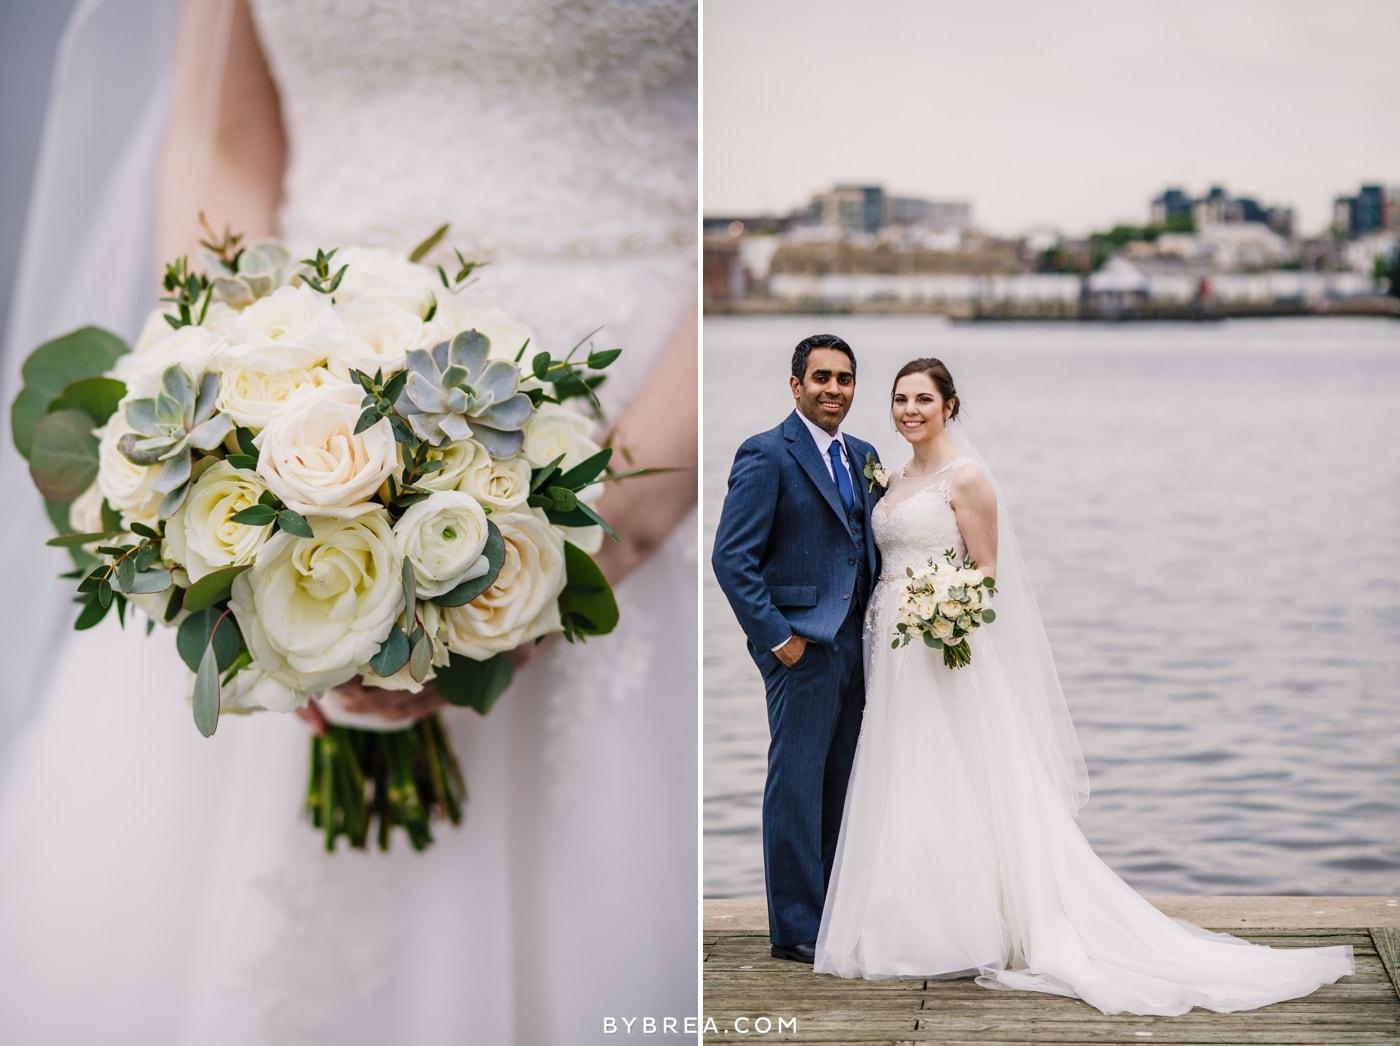 tracy-bharath-frederick-douglass-baltimore-wedding-photos_0284